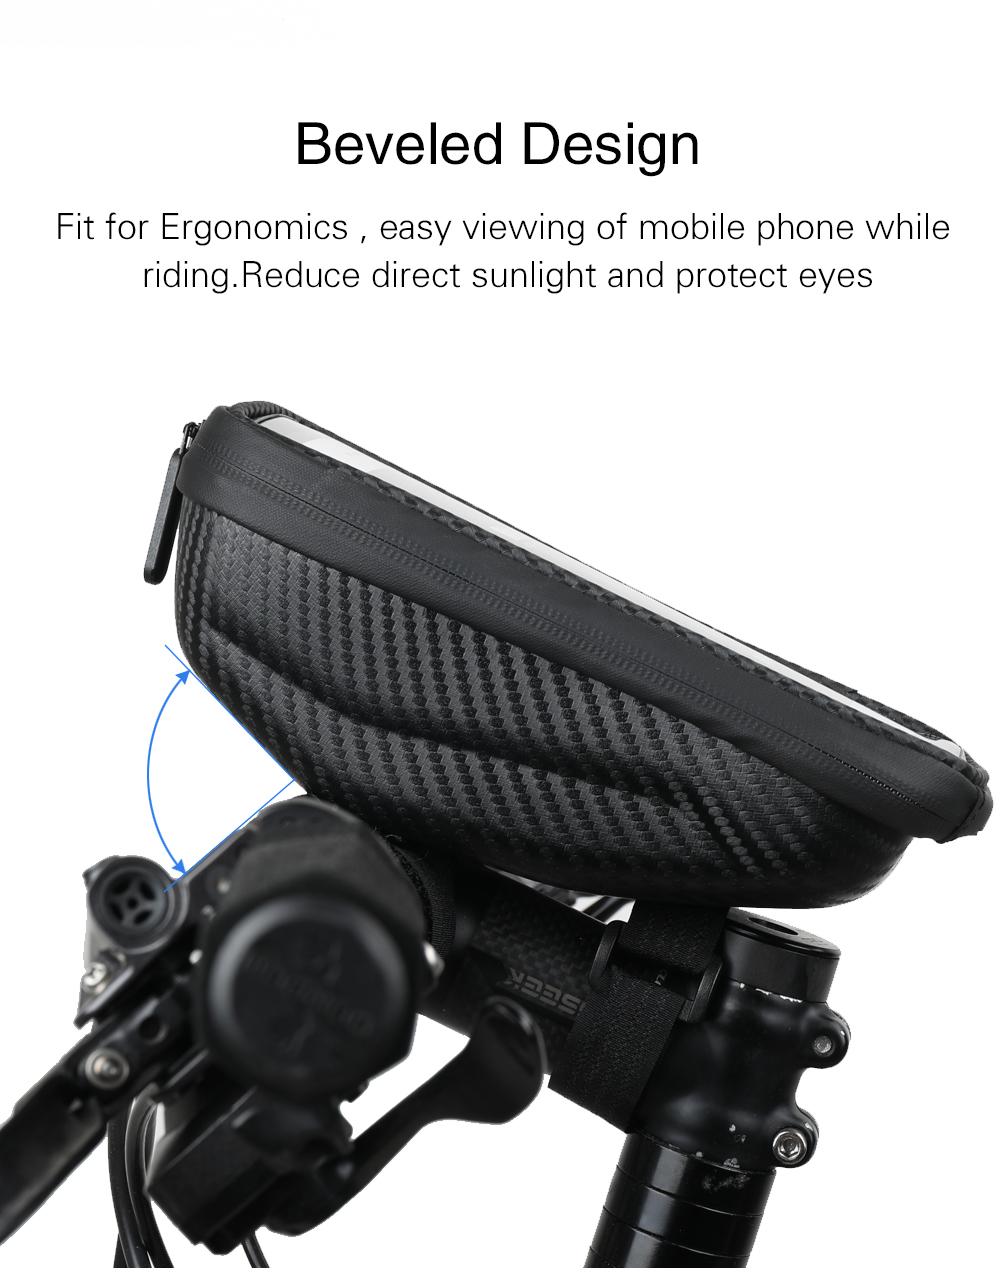 Rhinowalk Waterproof 6.5 Inch Phone Holder EVA Hard Shell Bike Bag